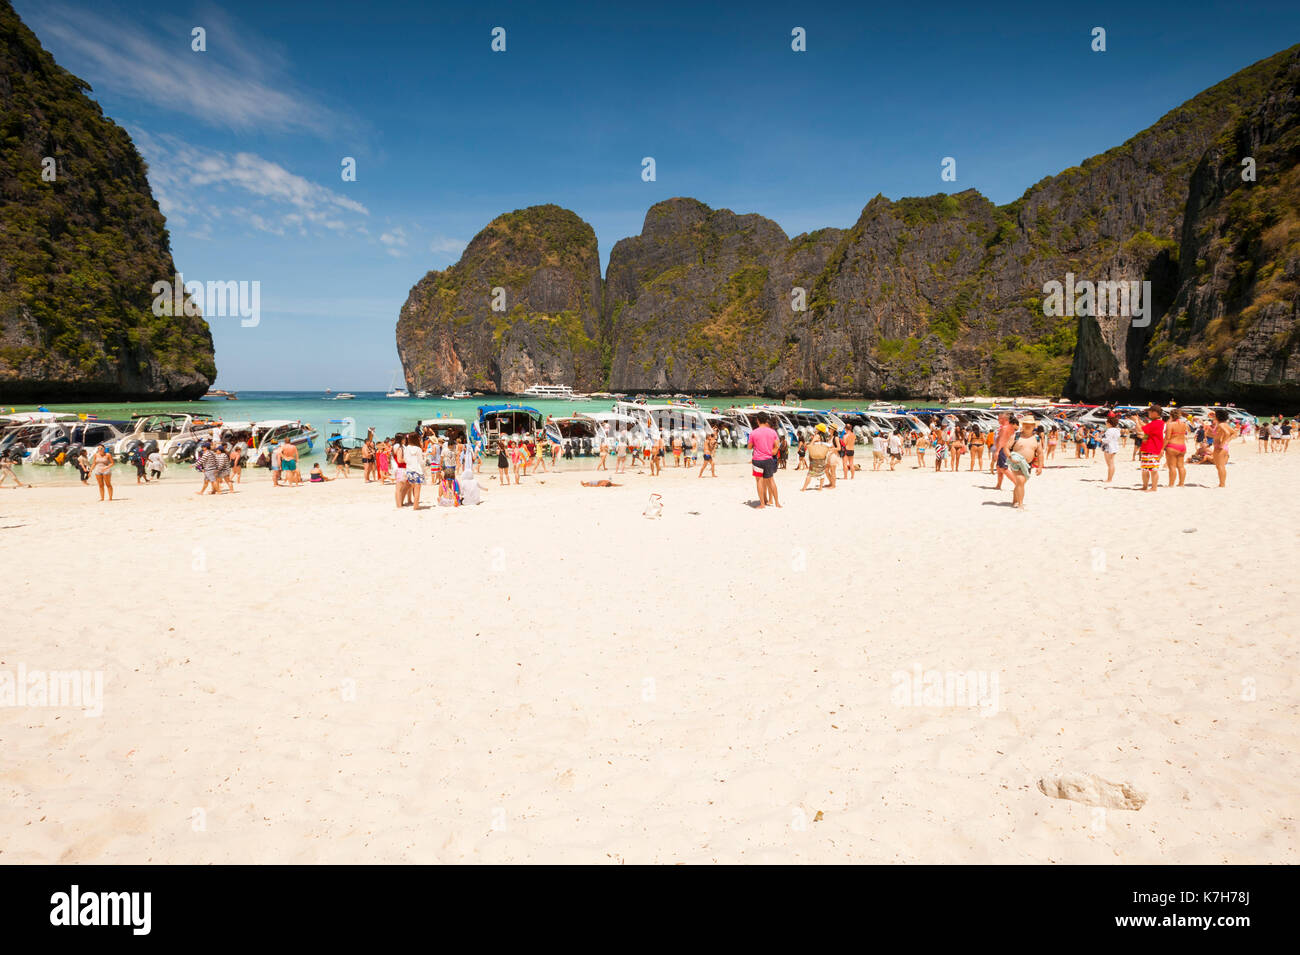 Tourists at Maya Bay, Ko Phi Phi Lee Island, Thailand. - Stock Image